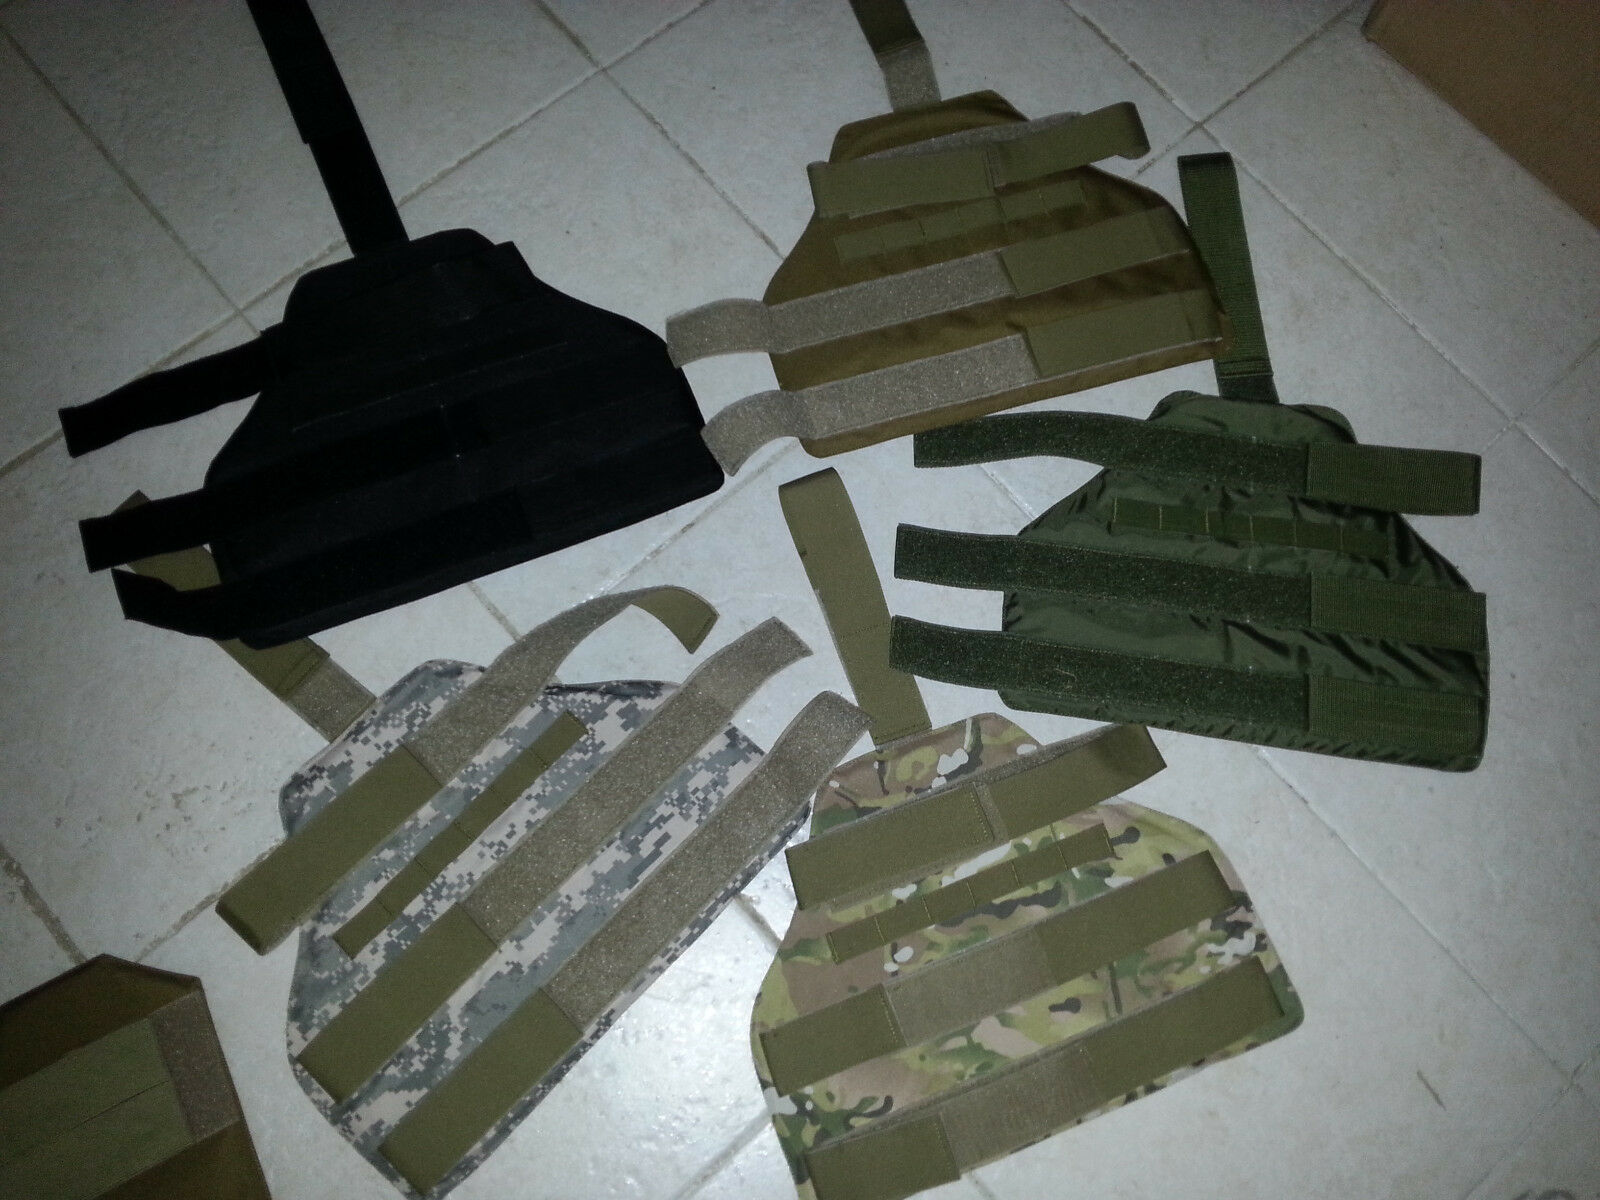 Ballistic UPPER LEG body armor IIIA RARE  thigh armor GEN 2 (multi cam)